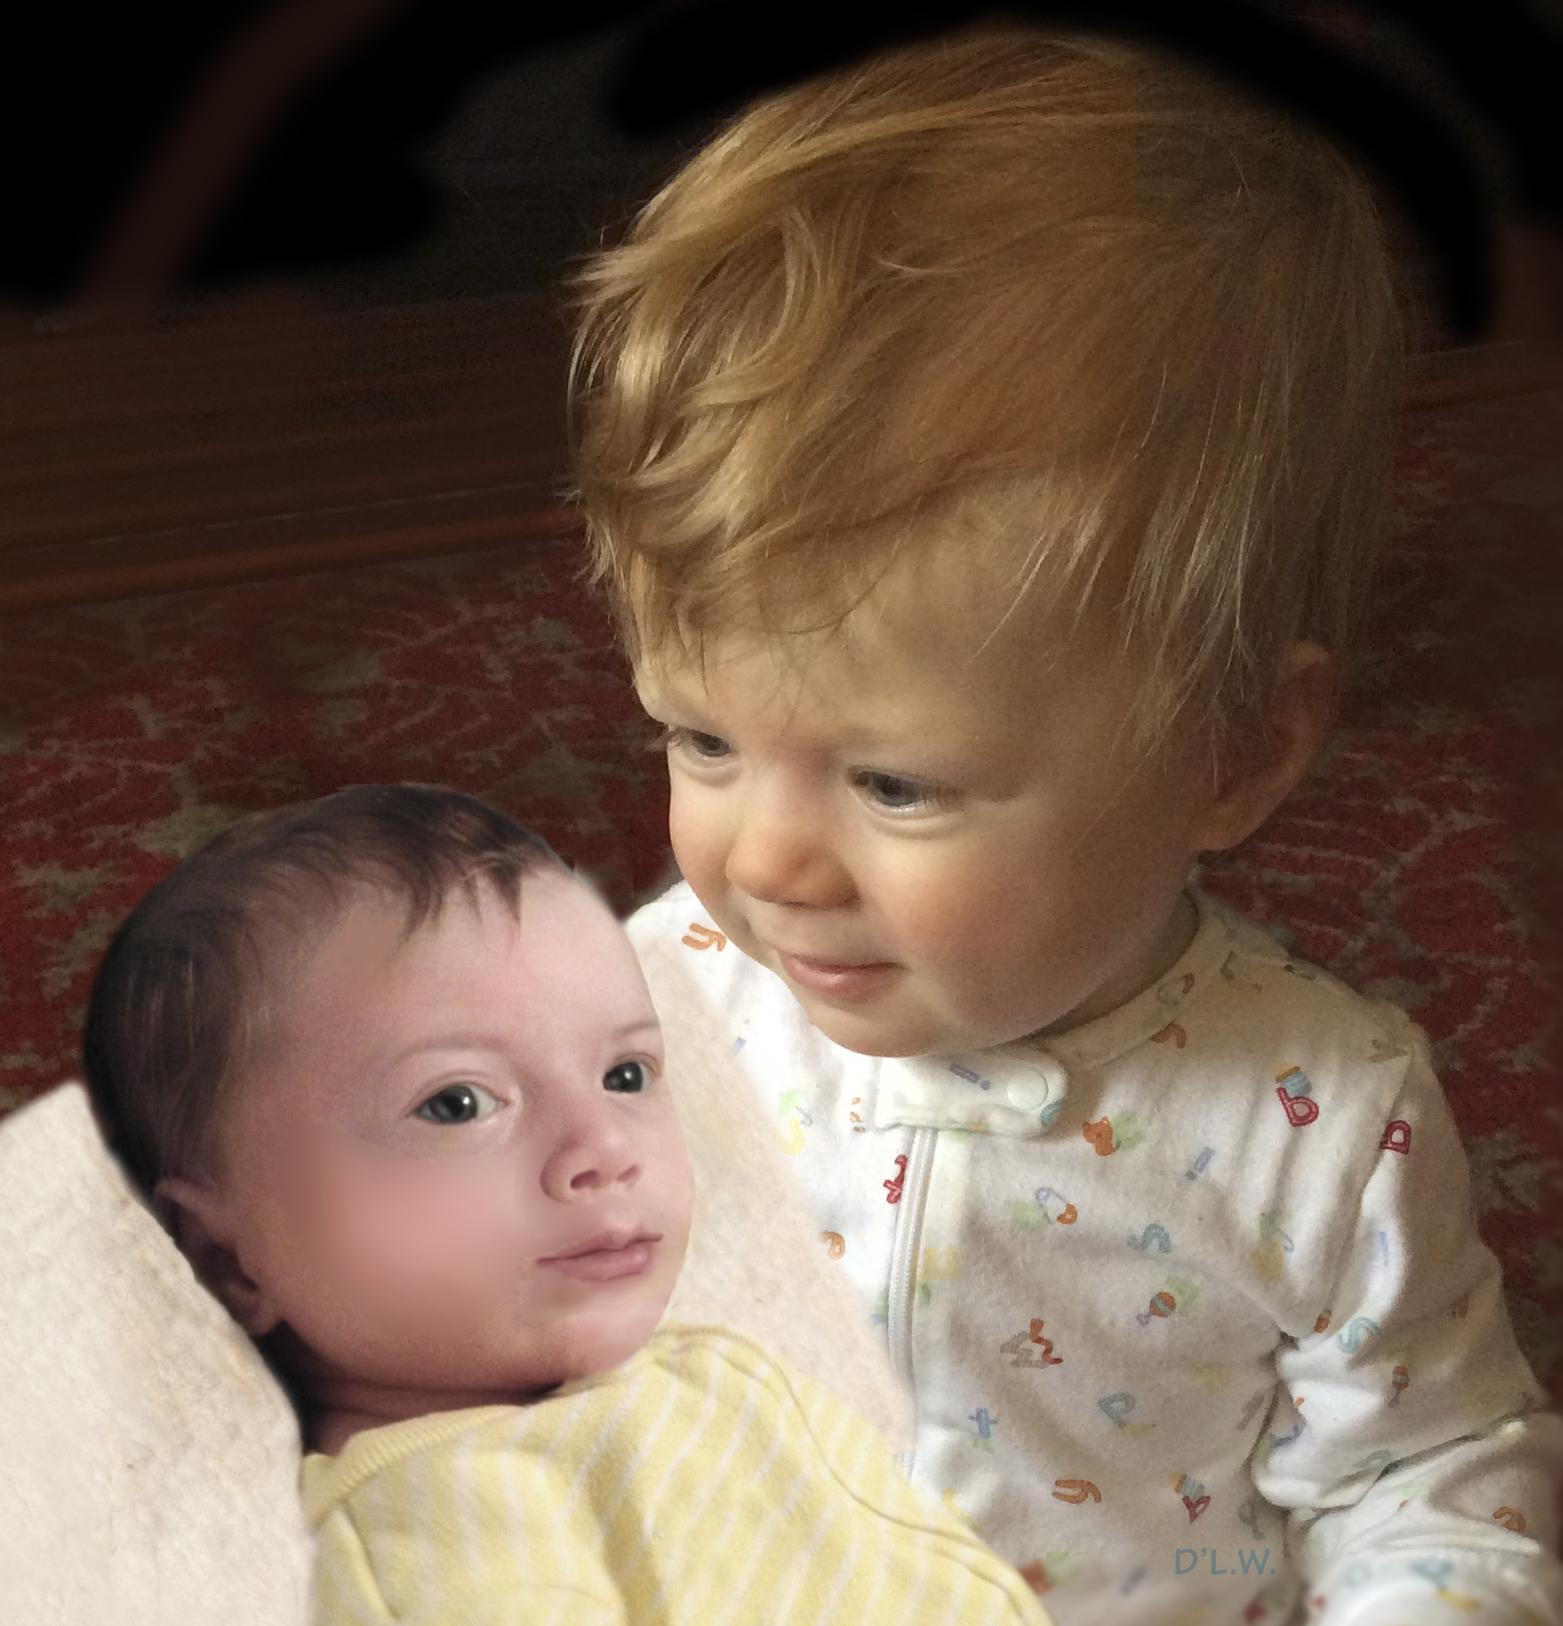 prince harry's future kids